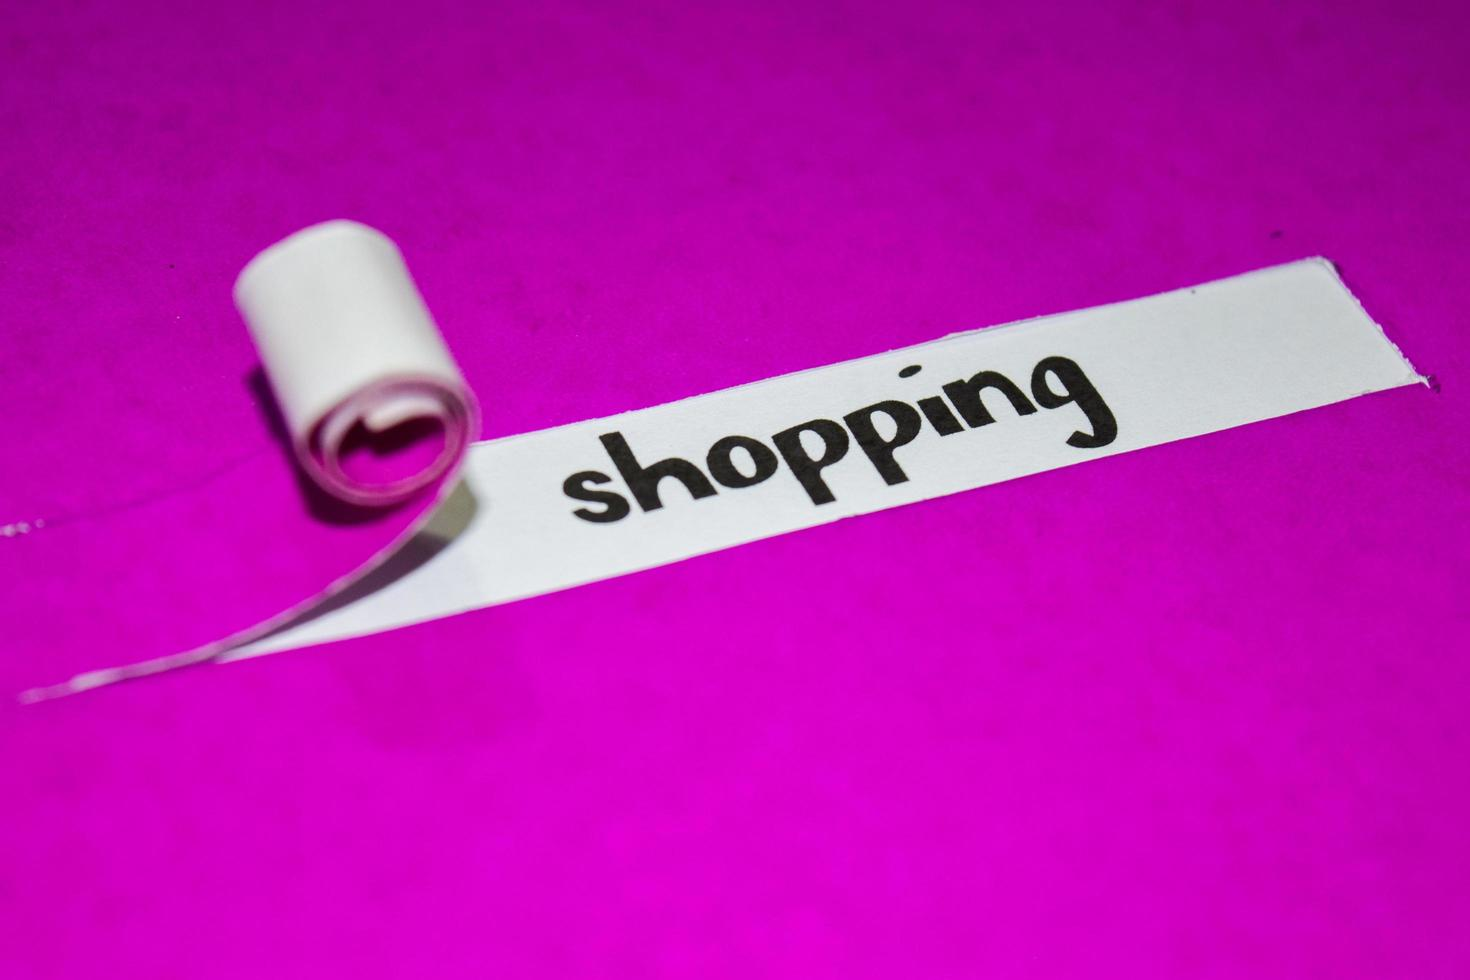 compras de texto, inspiración, motivación y concepto de negocio en papel rasgado púrpura foto